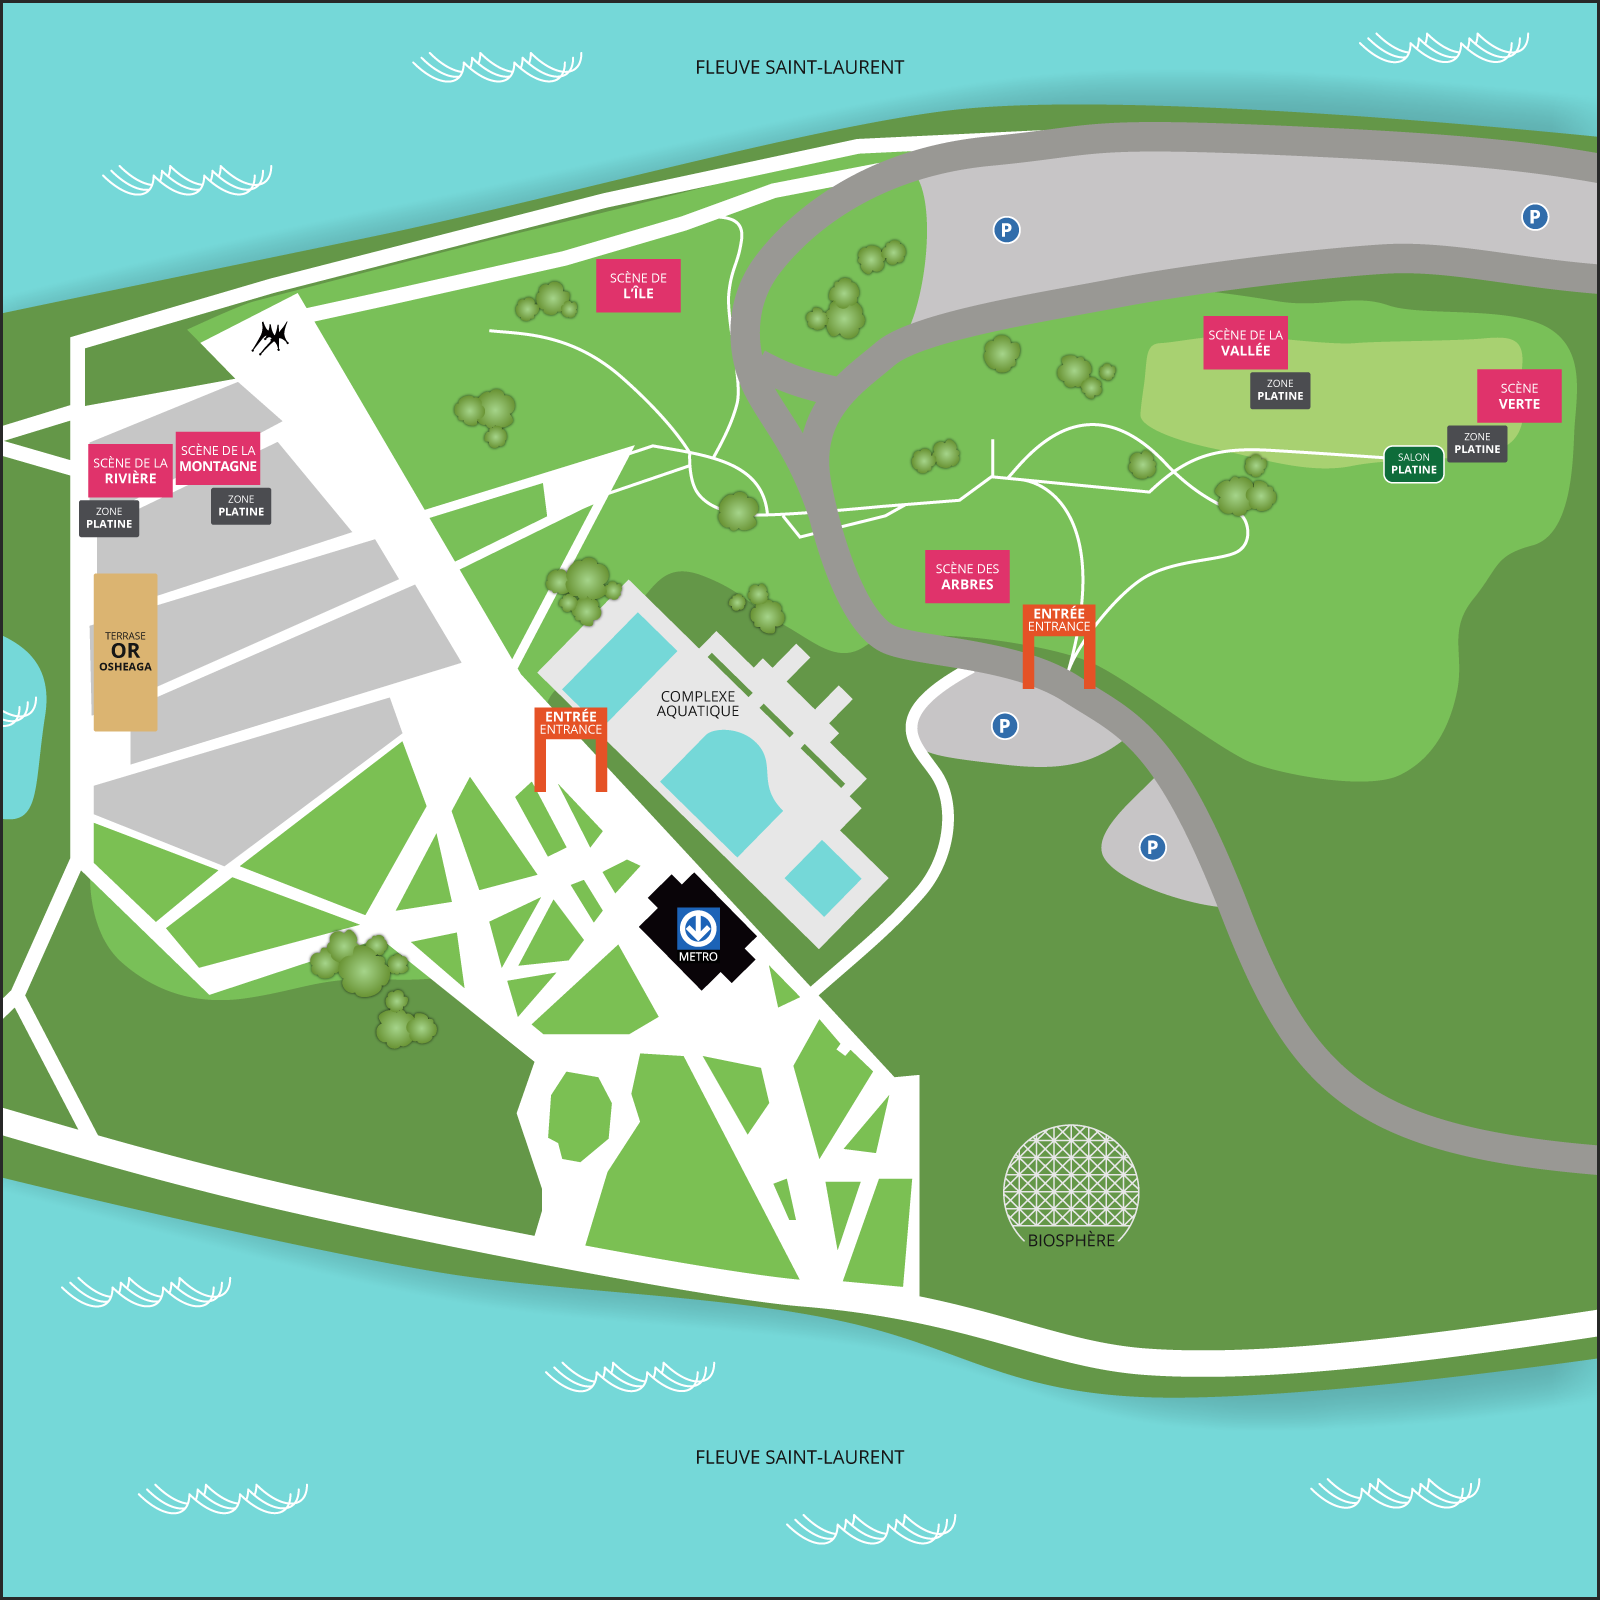 îleSoniq 2022 (previously 8 August 2020)